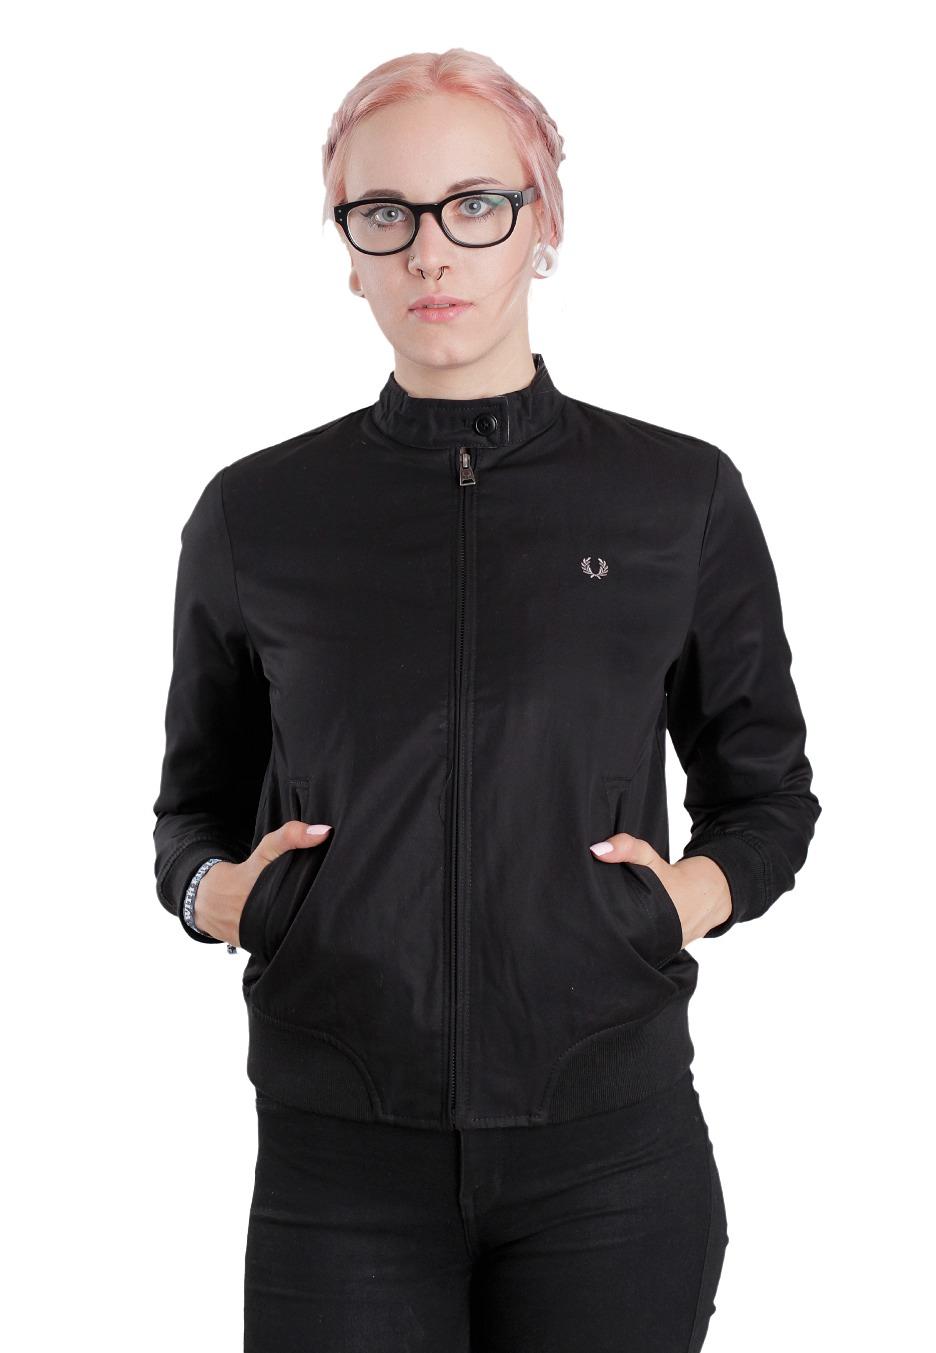 Fred perry womens harrington jacket